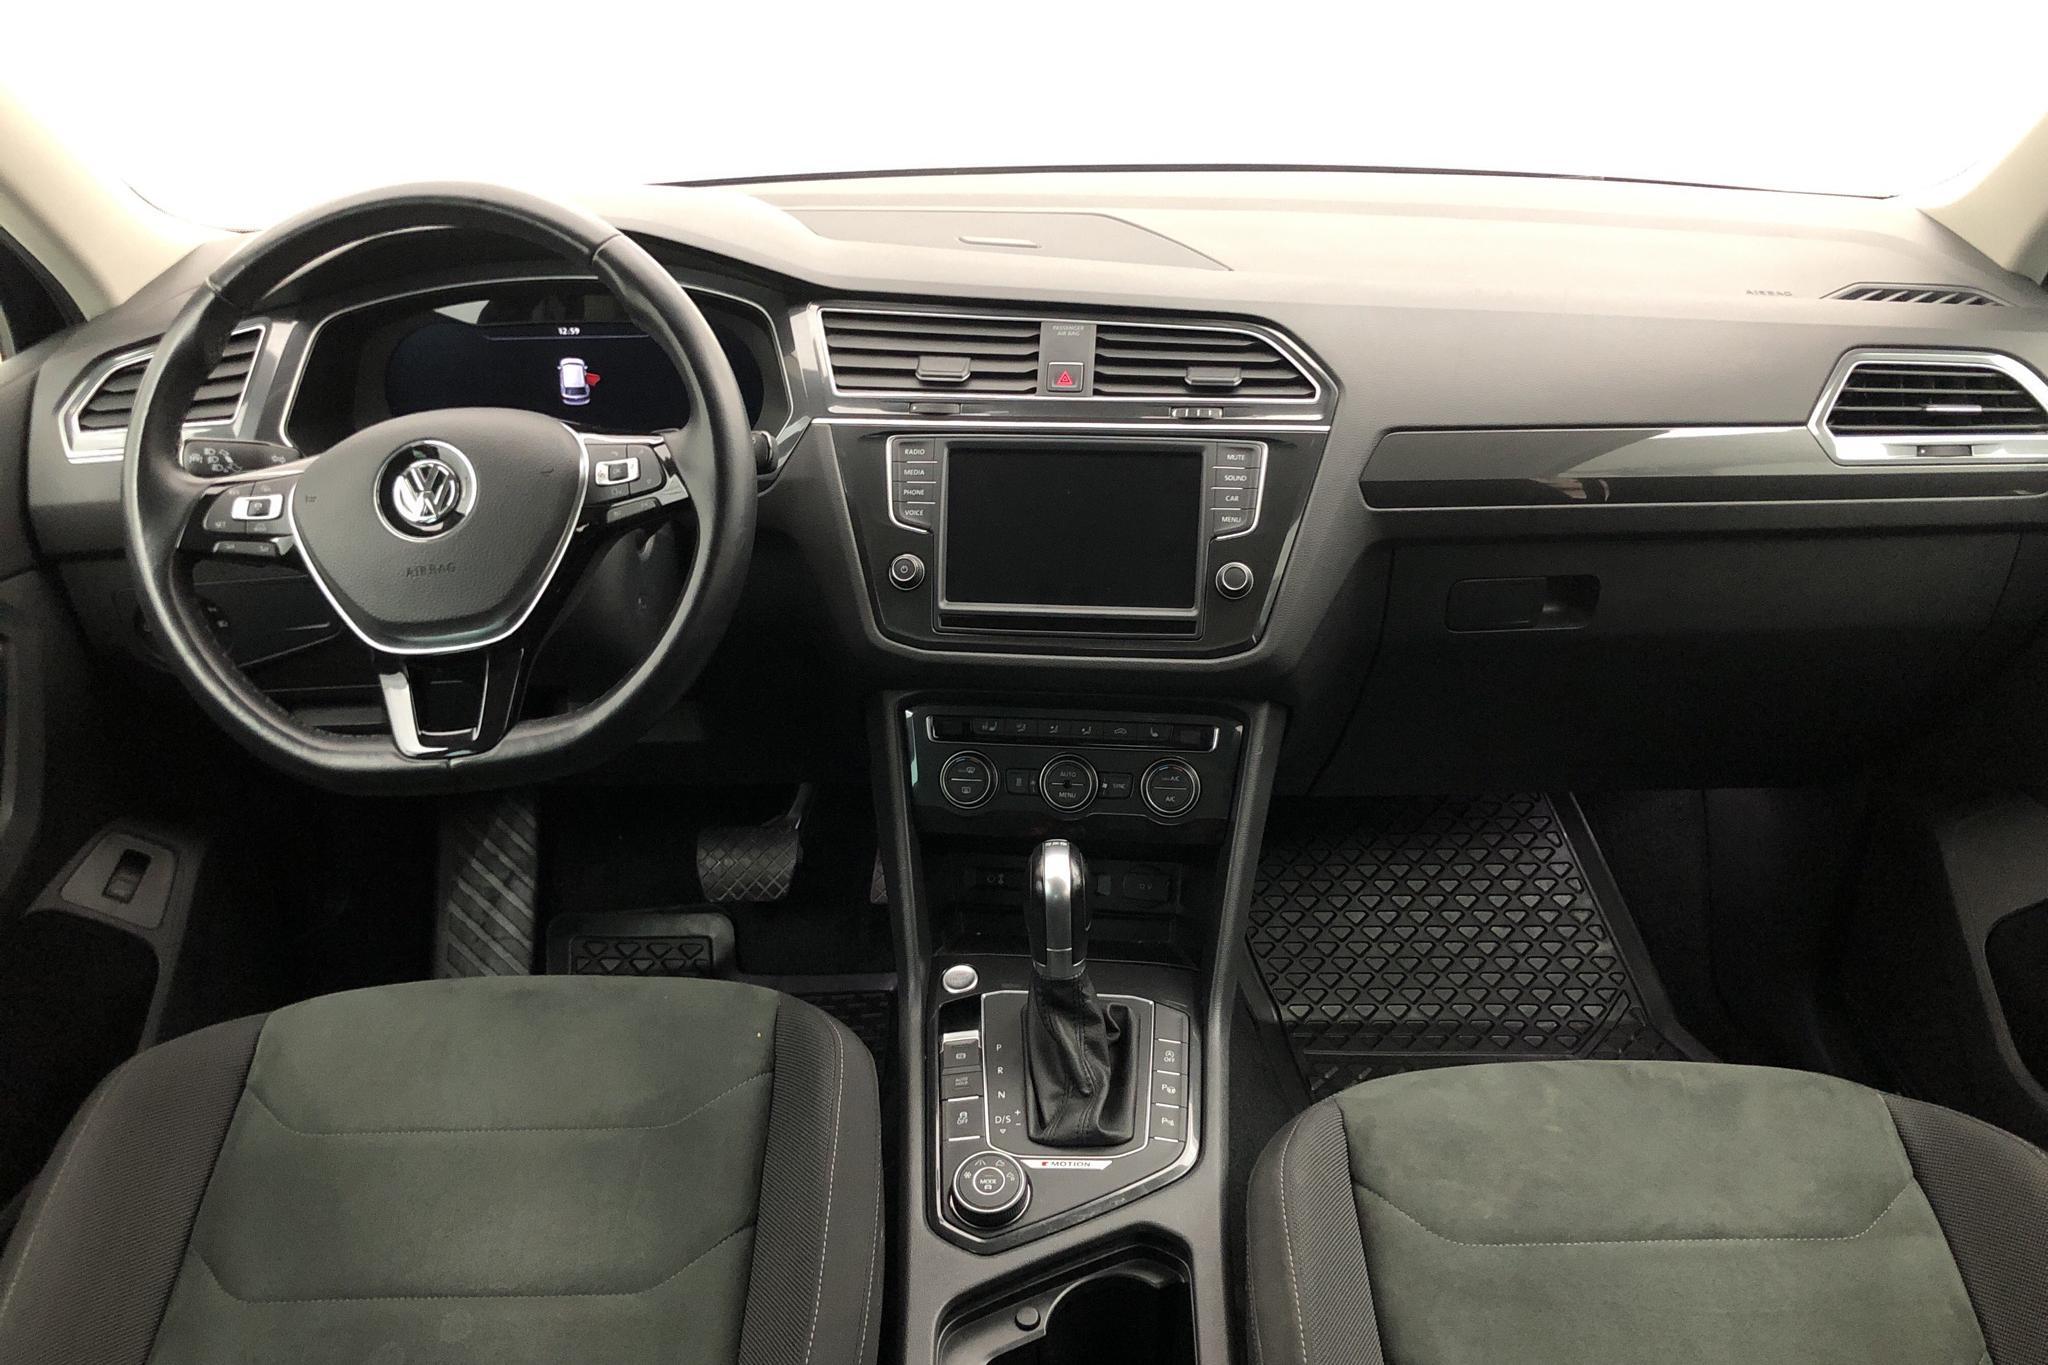 VW Tiguan 2.0 TDI 4MOTION (190hk) - 101 760 km - Automatic - Dark Blue - 2016